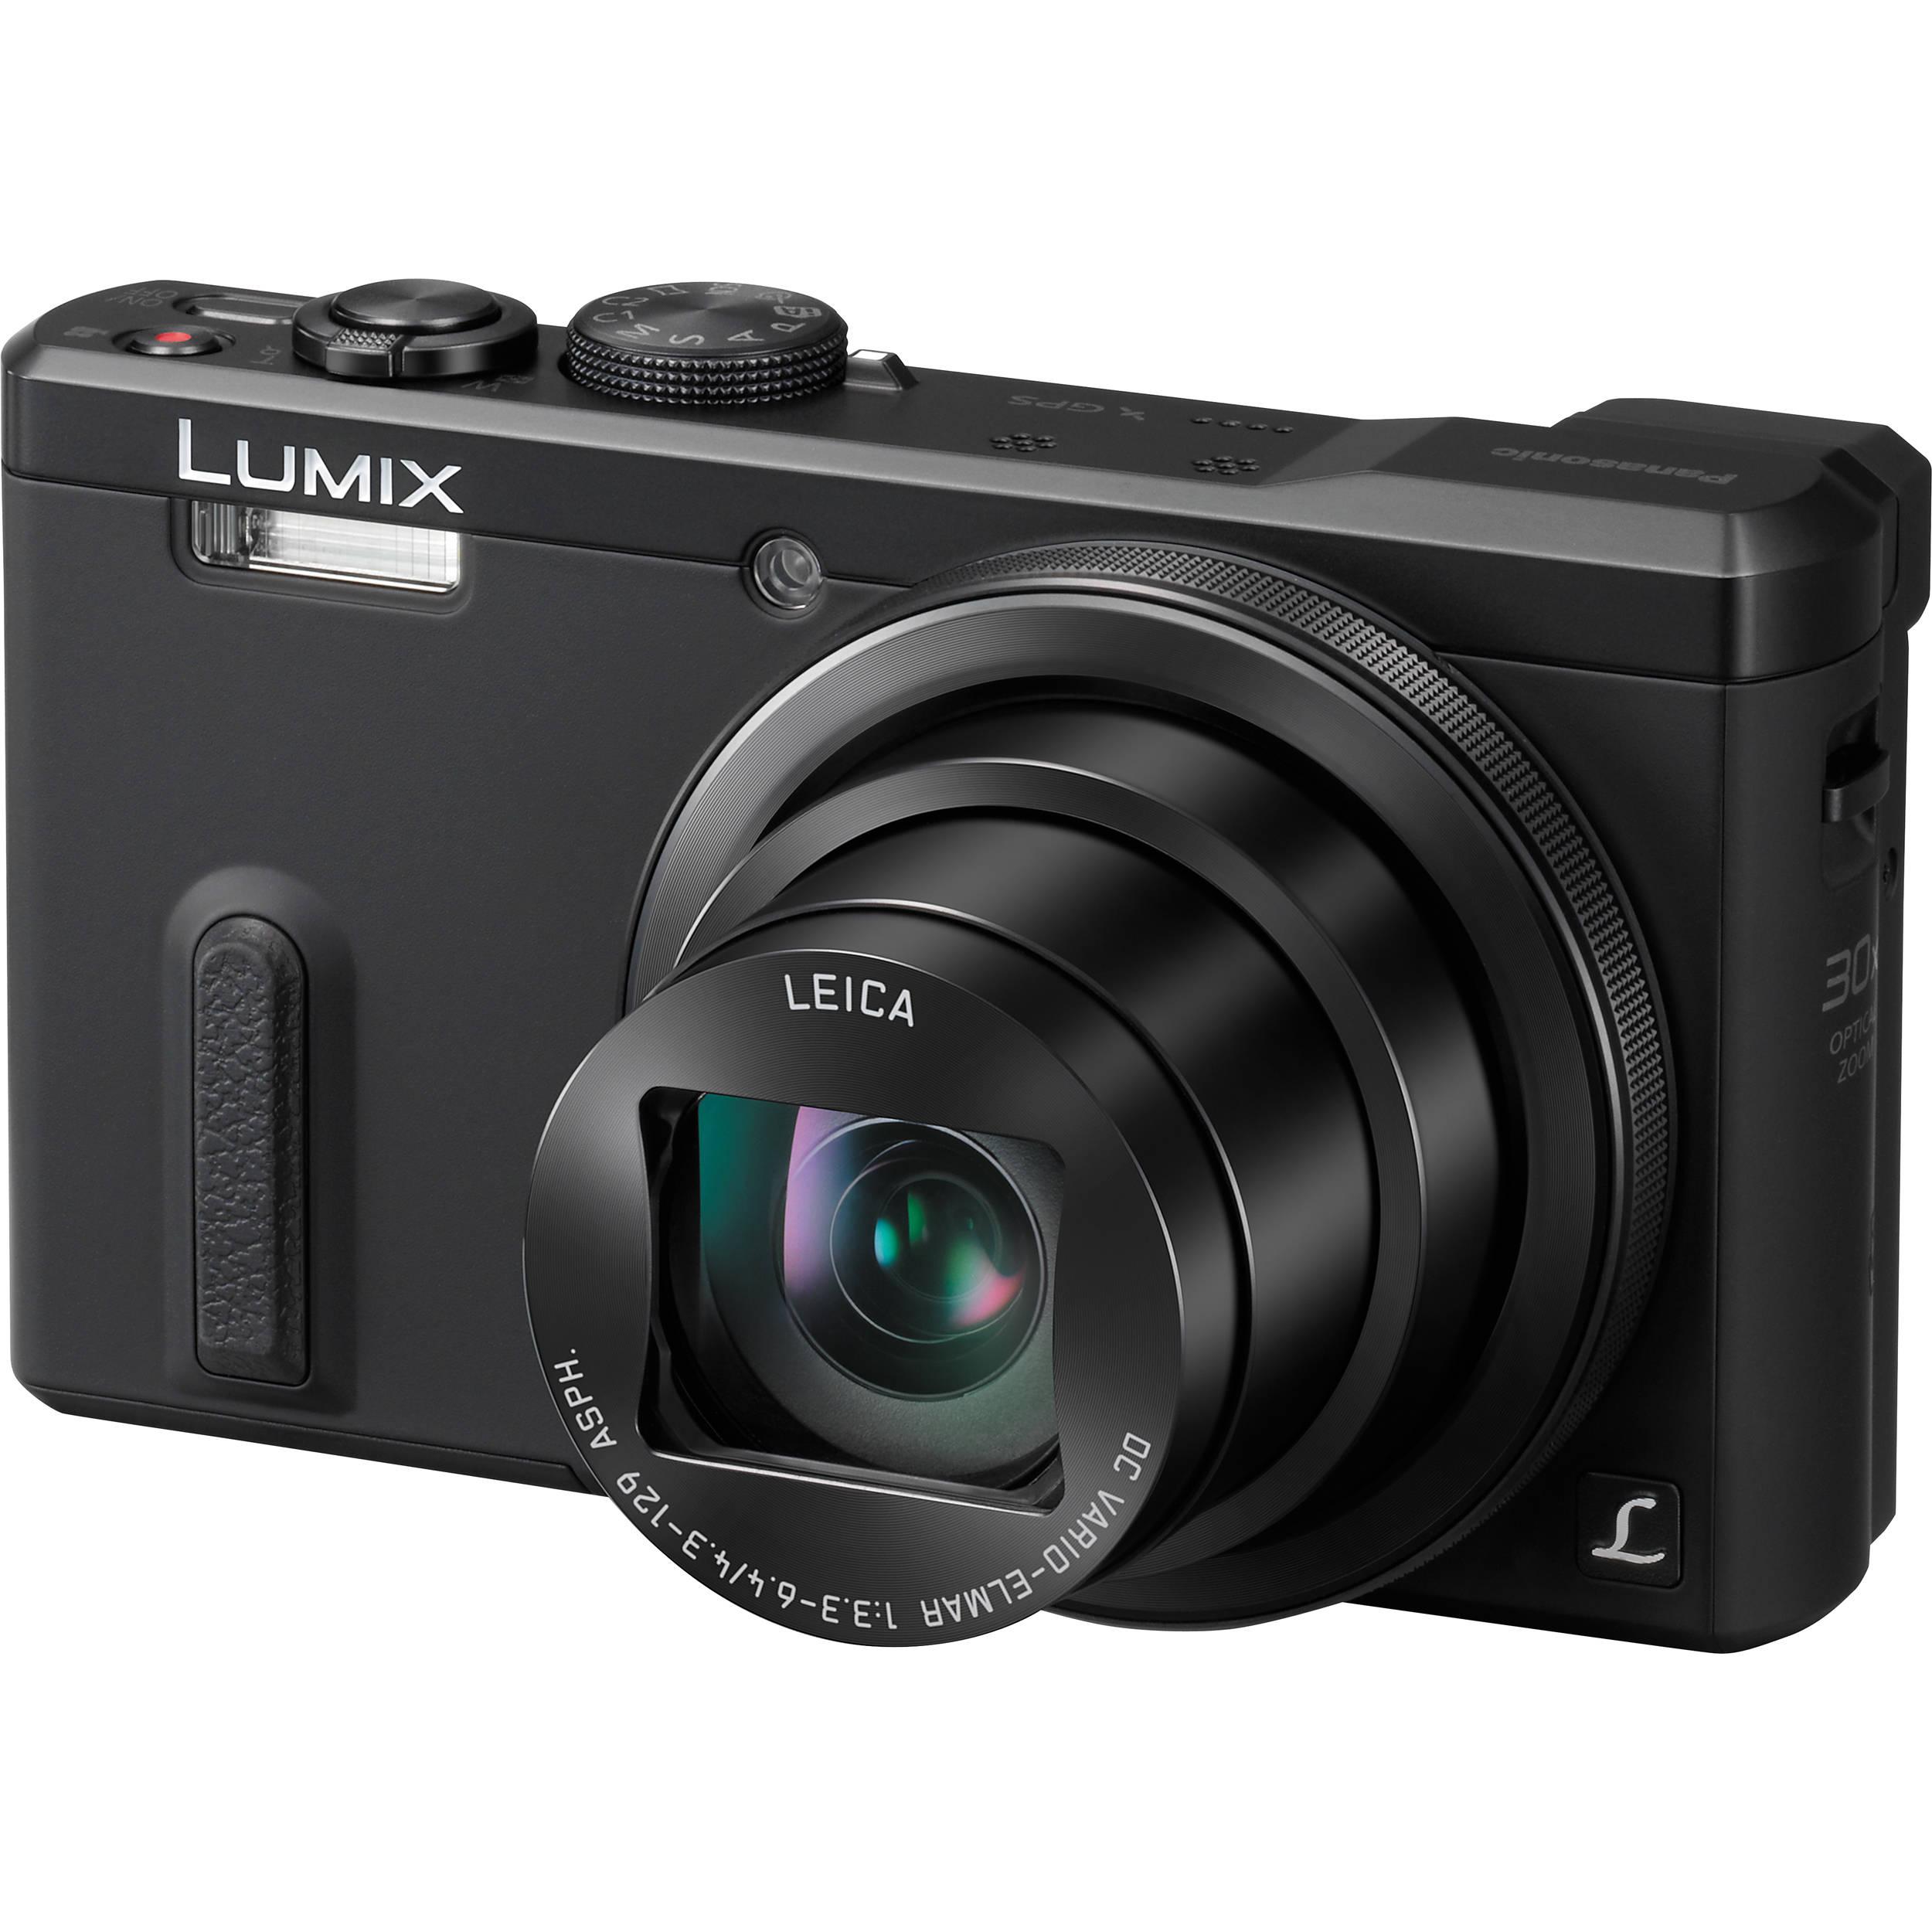 camera panasonic lumix digital dmc zs40 gps pocket compact zoom leica optical